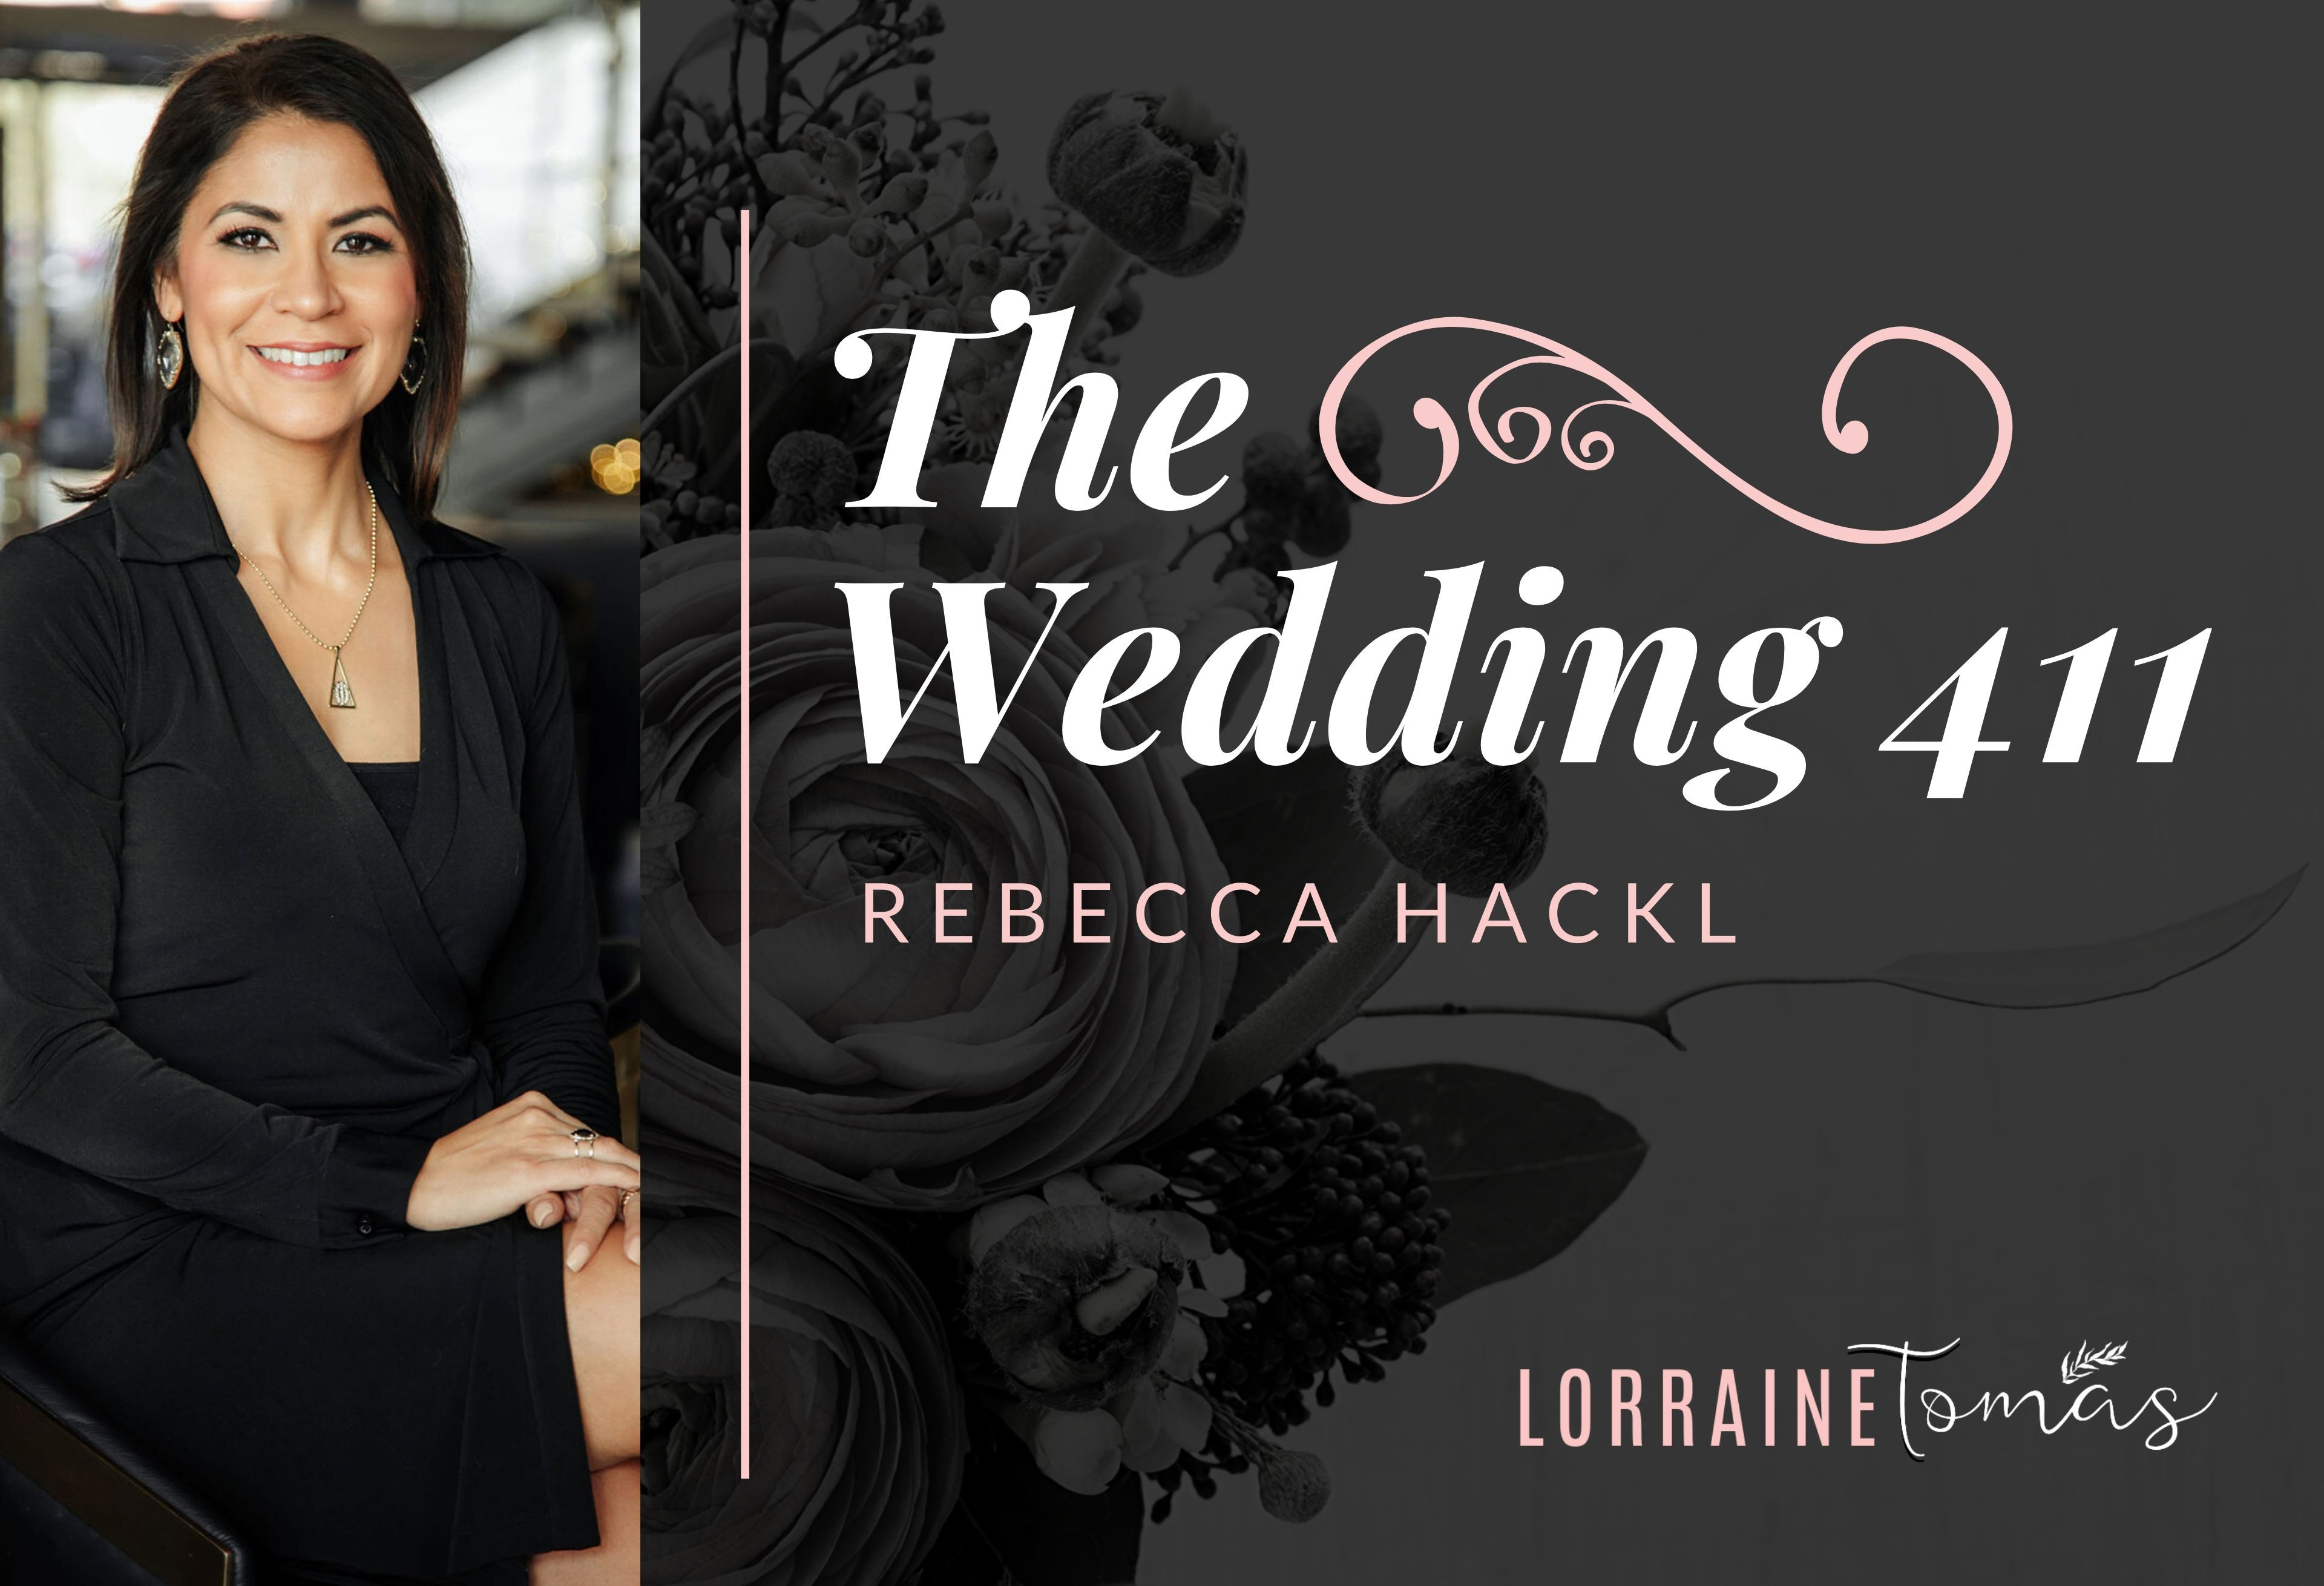 The Wedding 411 - Rebecca Hackl